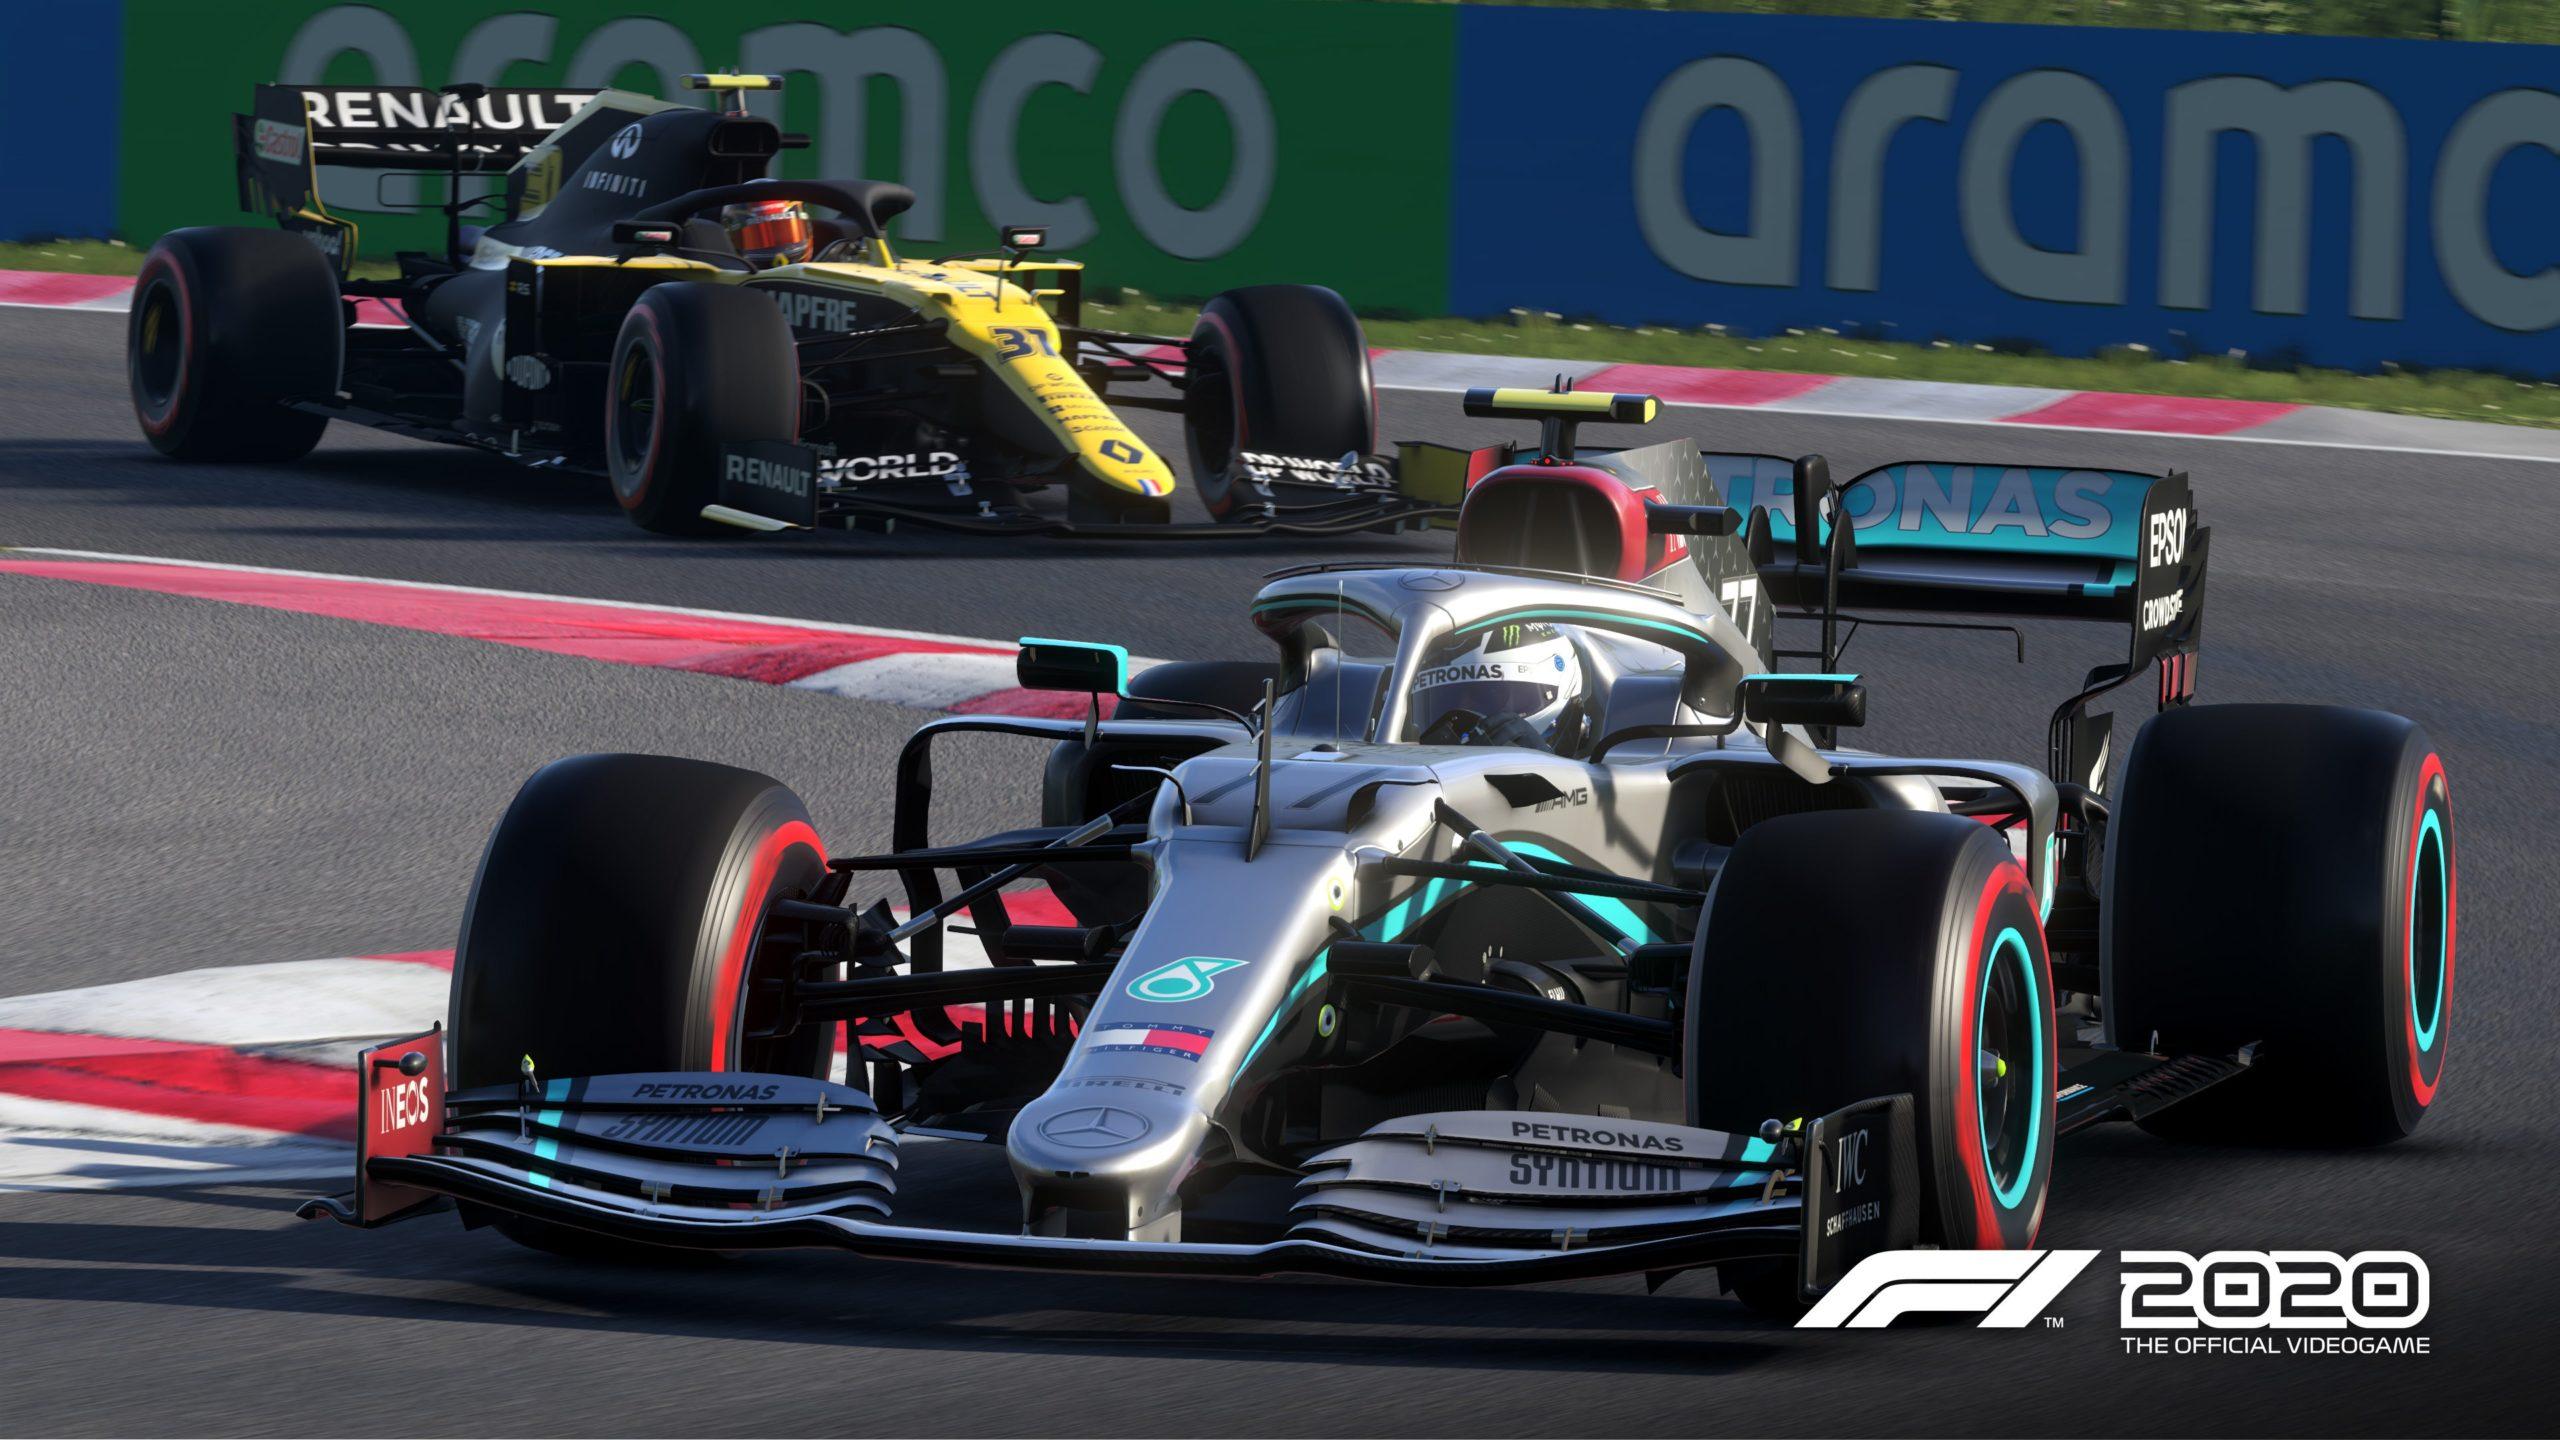 F1-2020_Hungary_Screen_11_4K